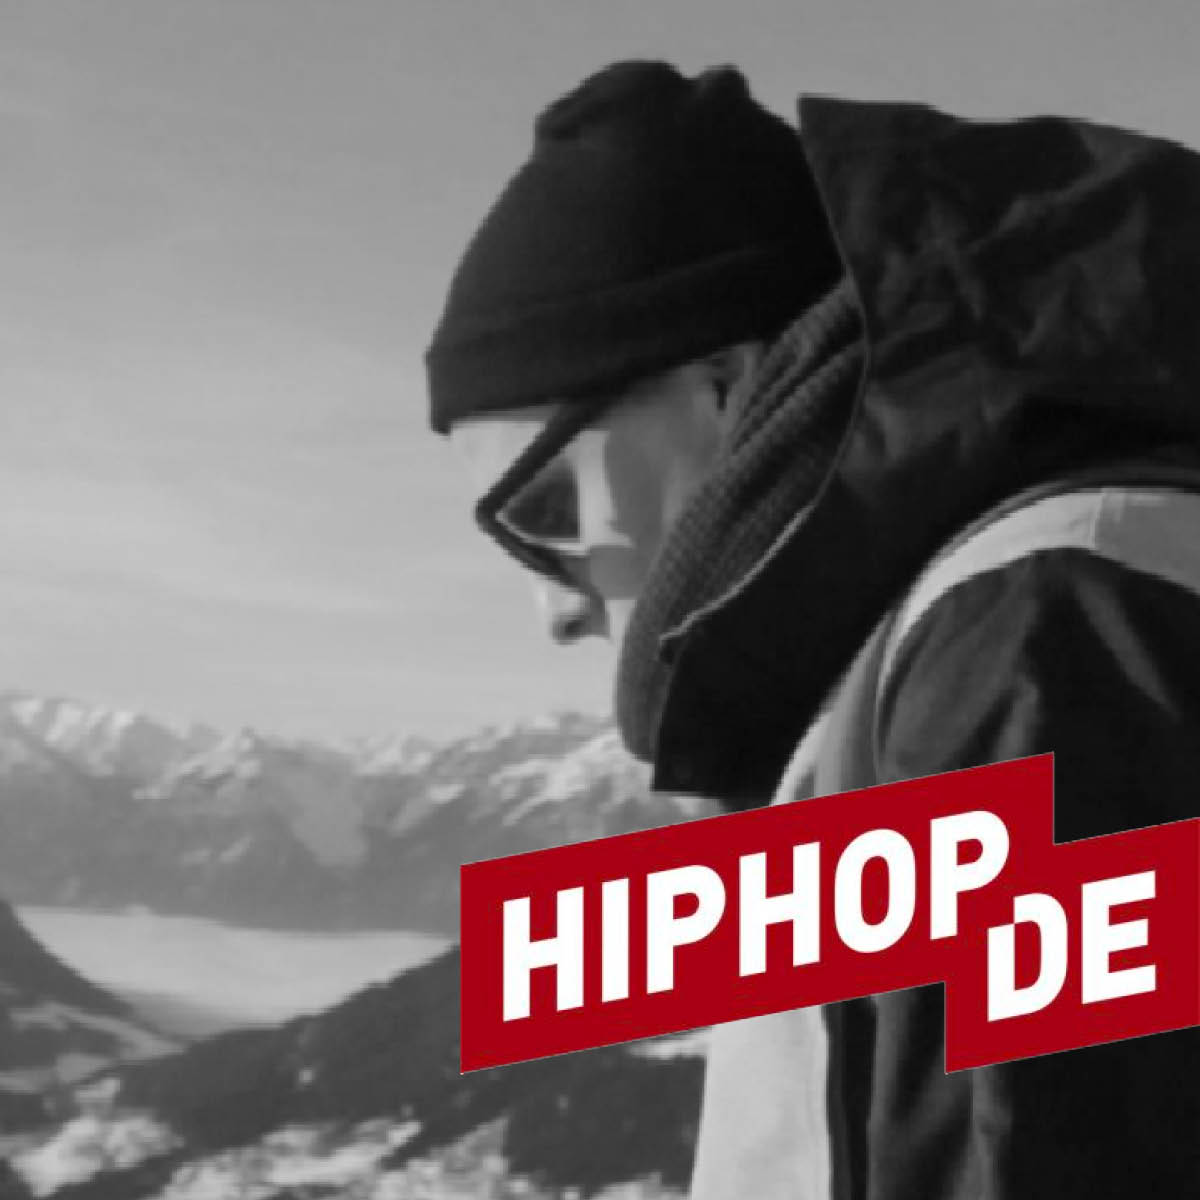 Upcoming: Herr Kuchen - Weltallfrieden (Single)